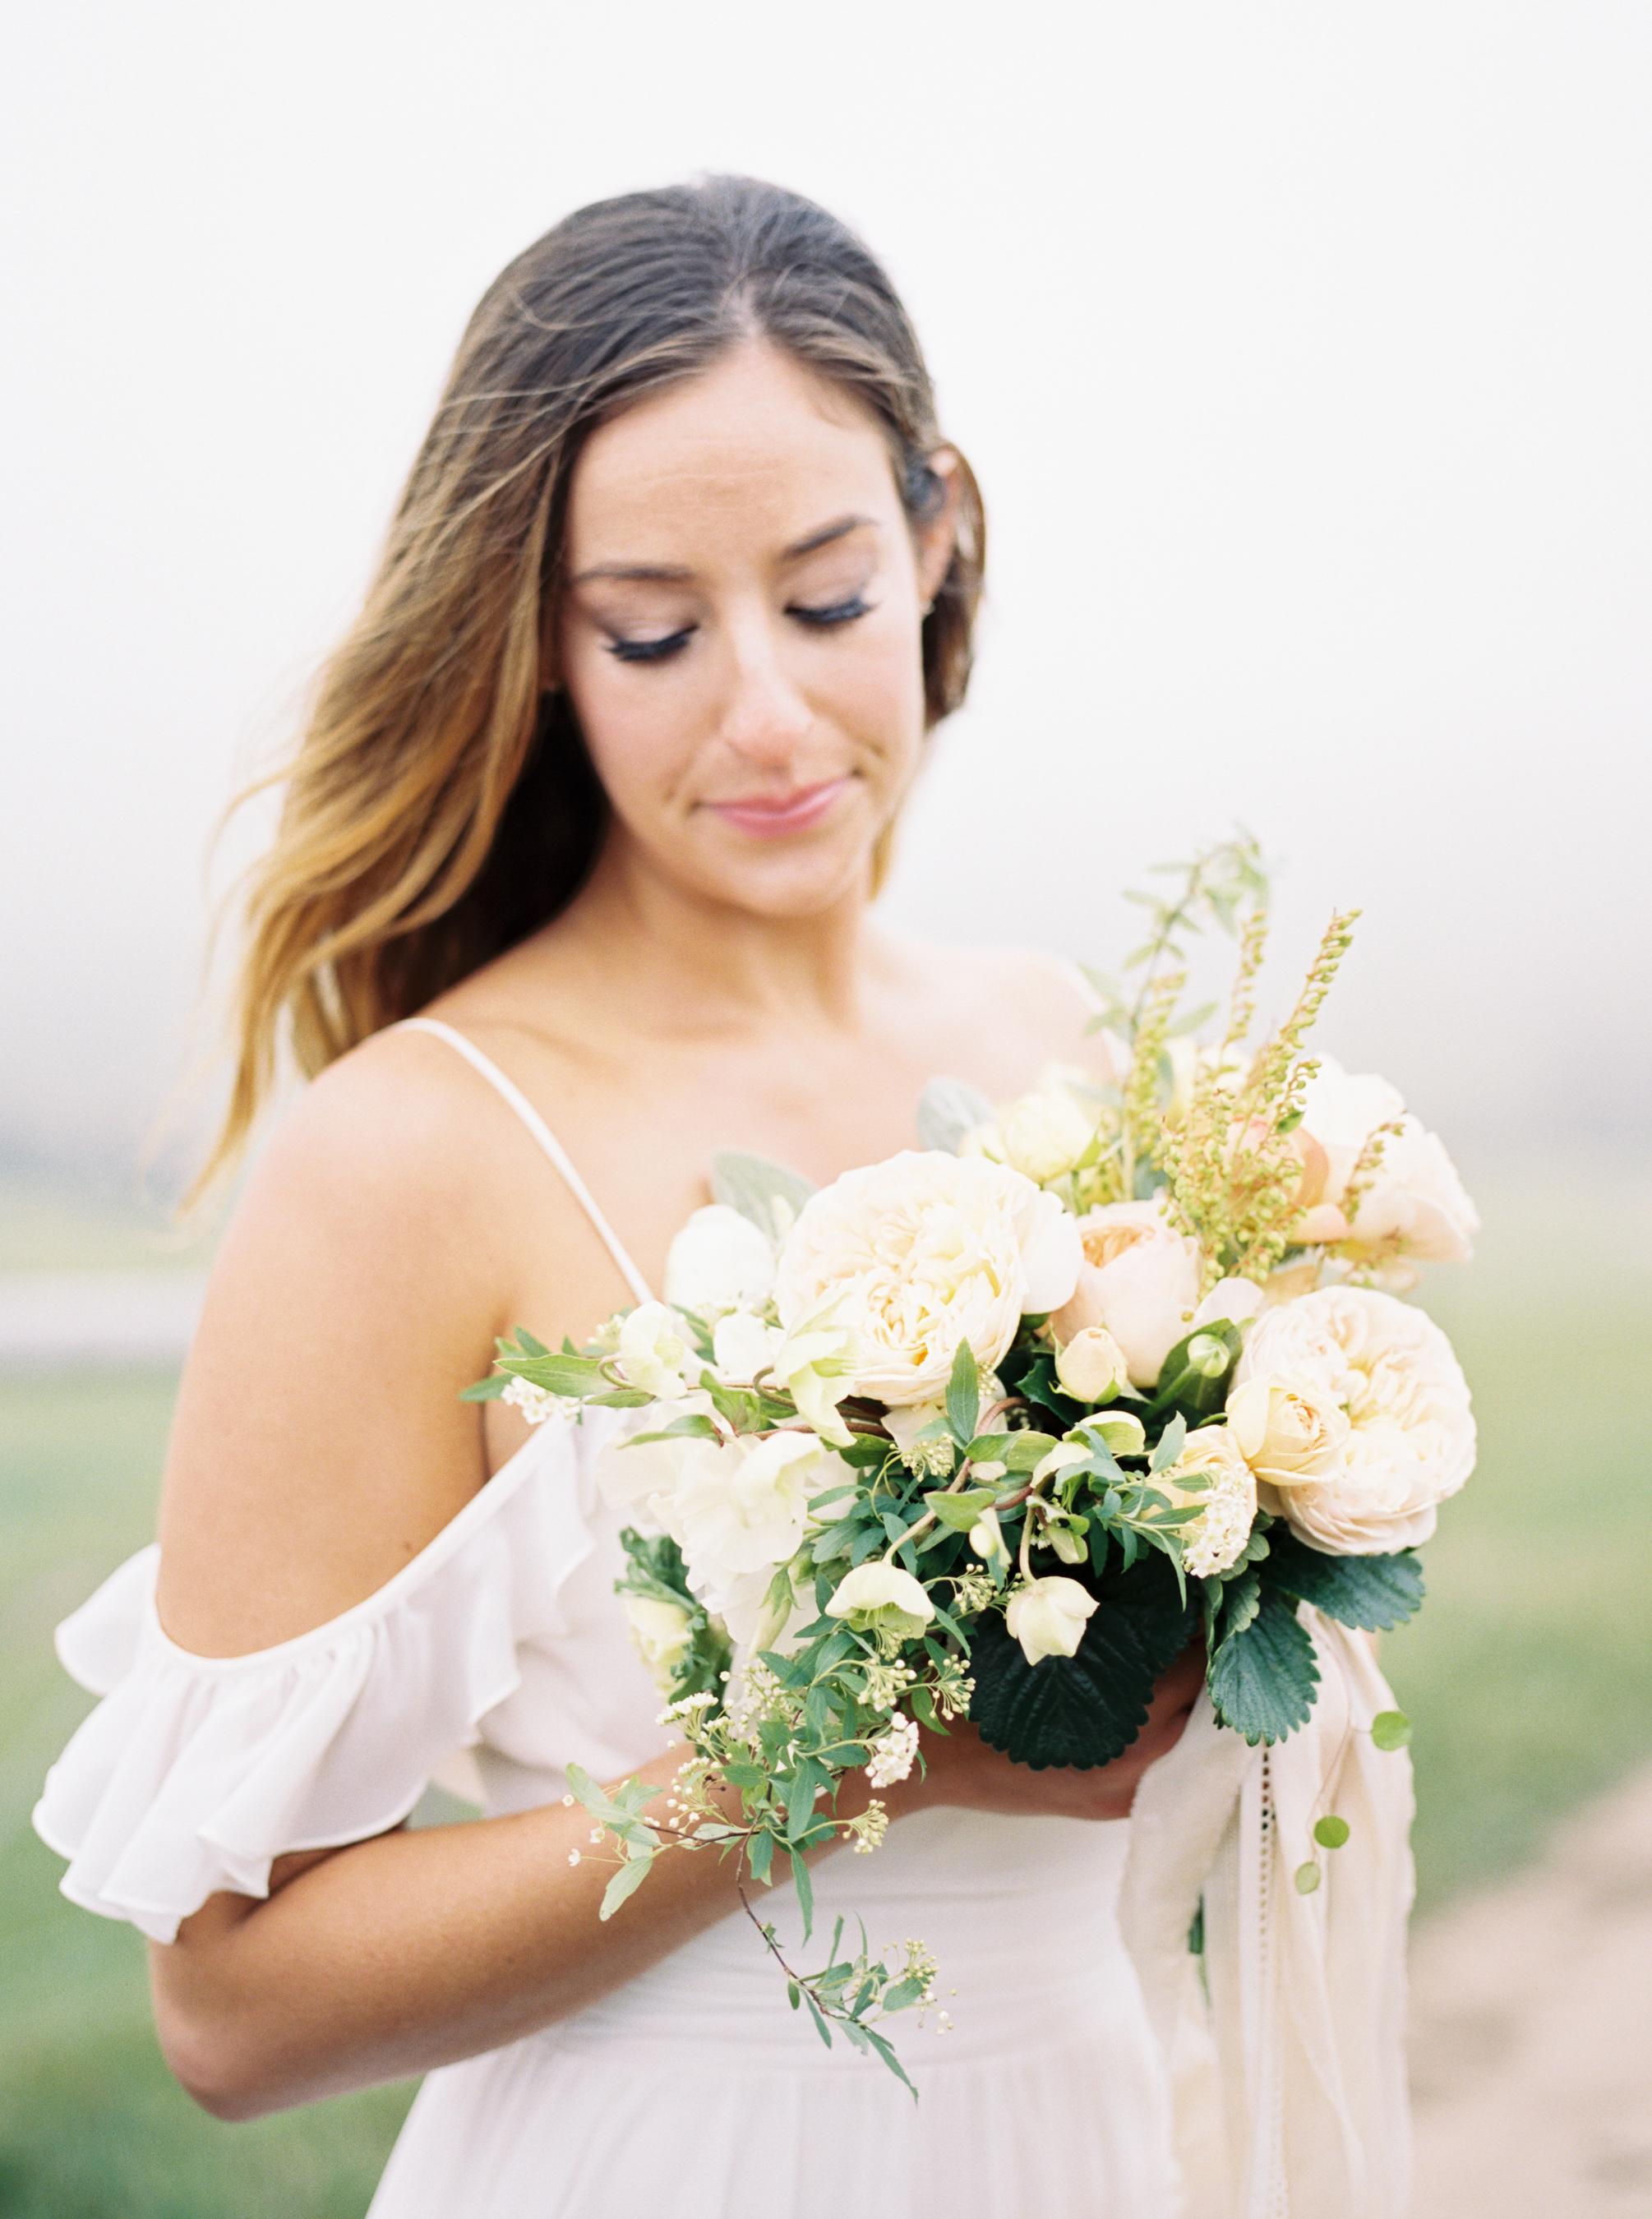 Danford-Photography-Bozeman-Montana-California-Wedding-Engagement-Photographer-30.jpg